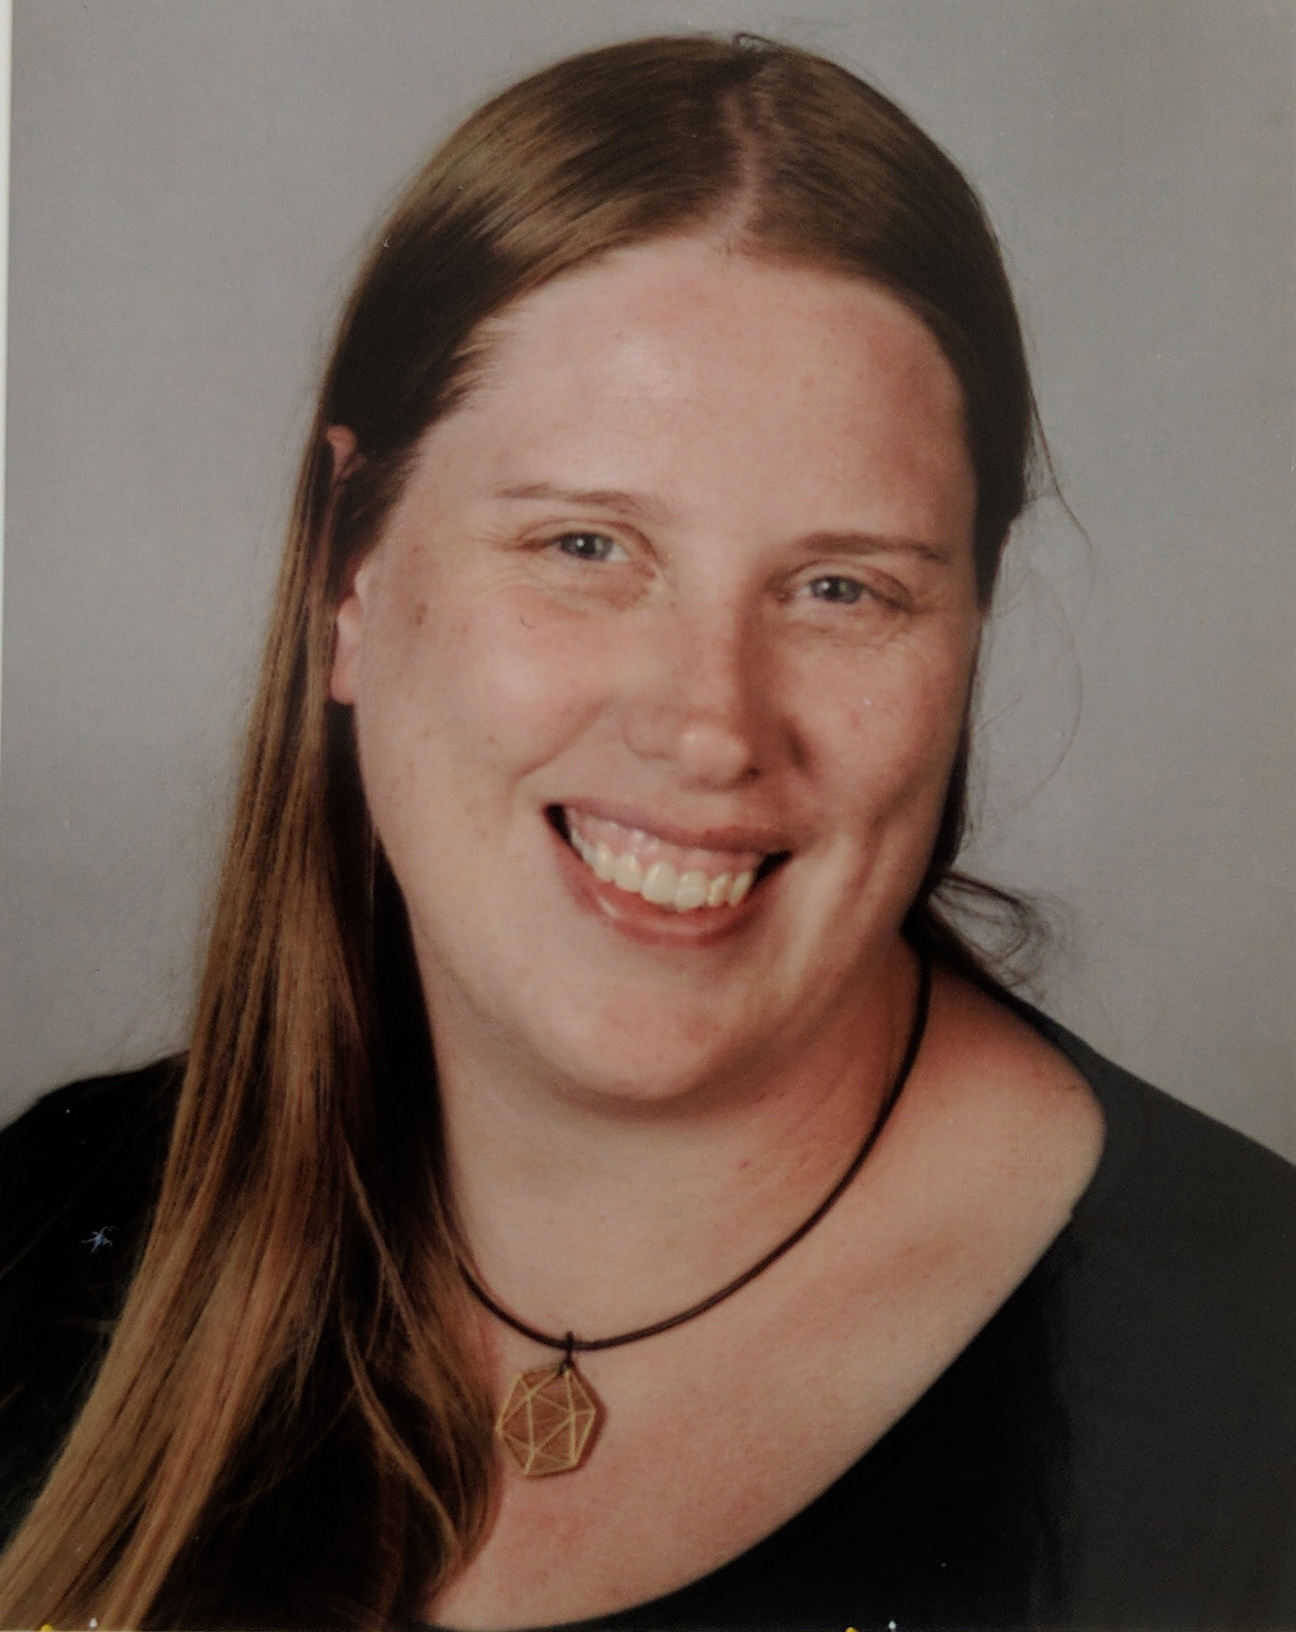 Julie Sloth Jensen